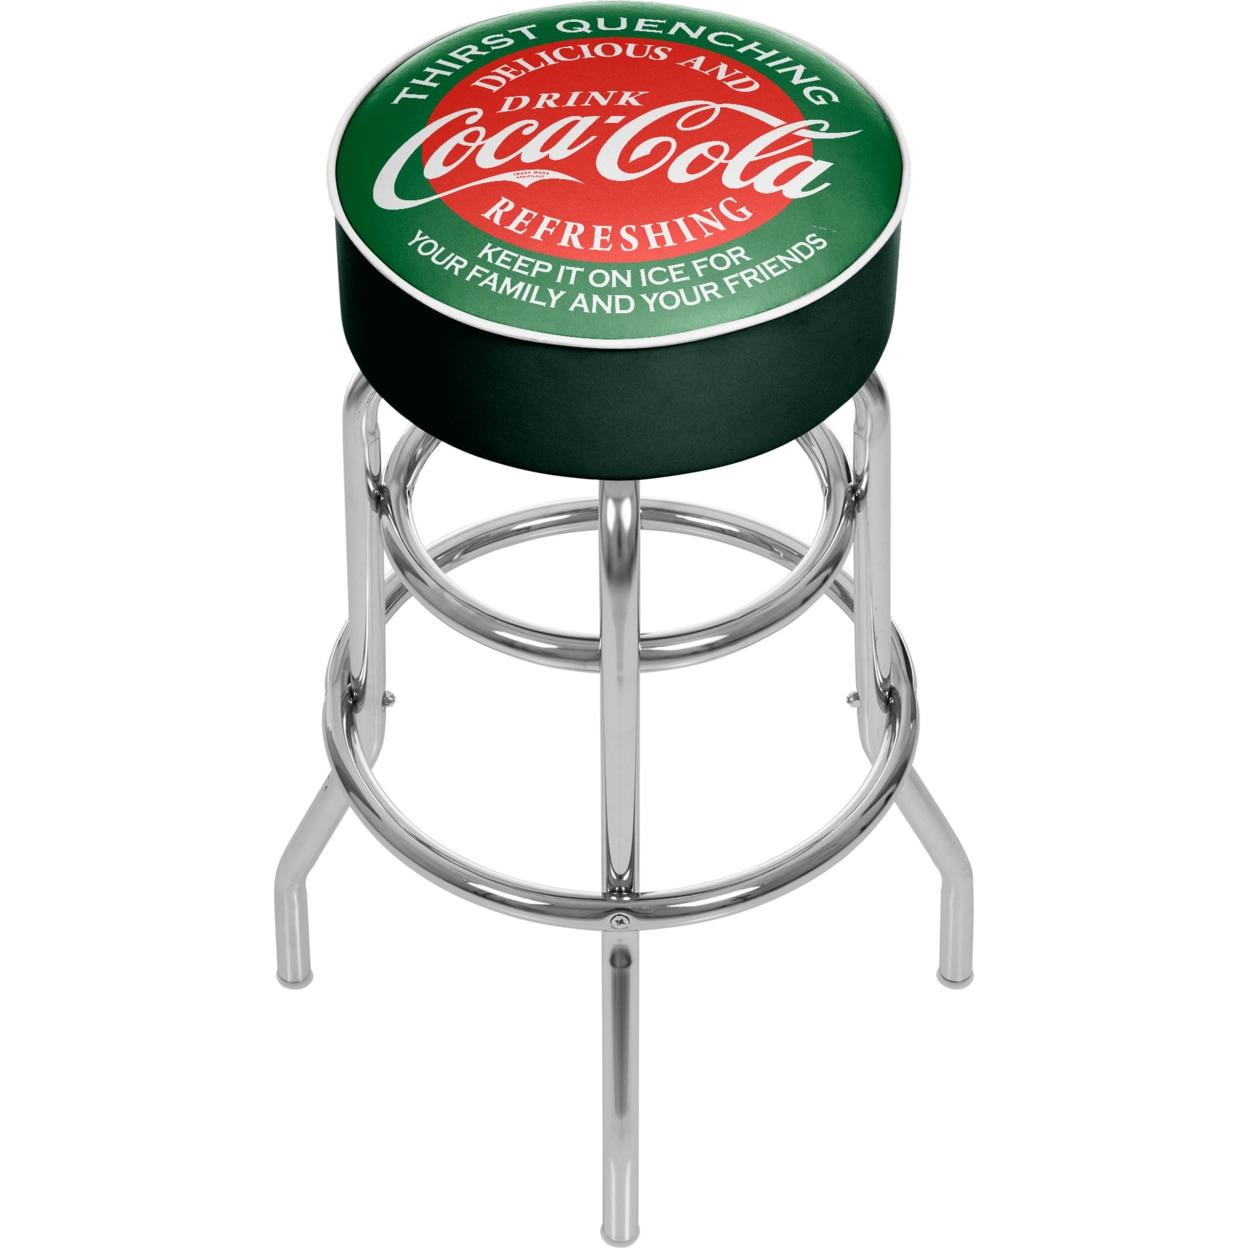 Red and Green Coca Cola Padded Swivel Bar Stool 30 Inches High coca cola vanilla нижний новгород